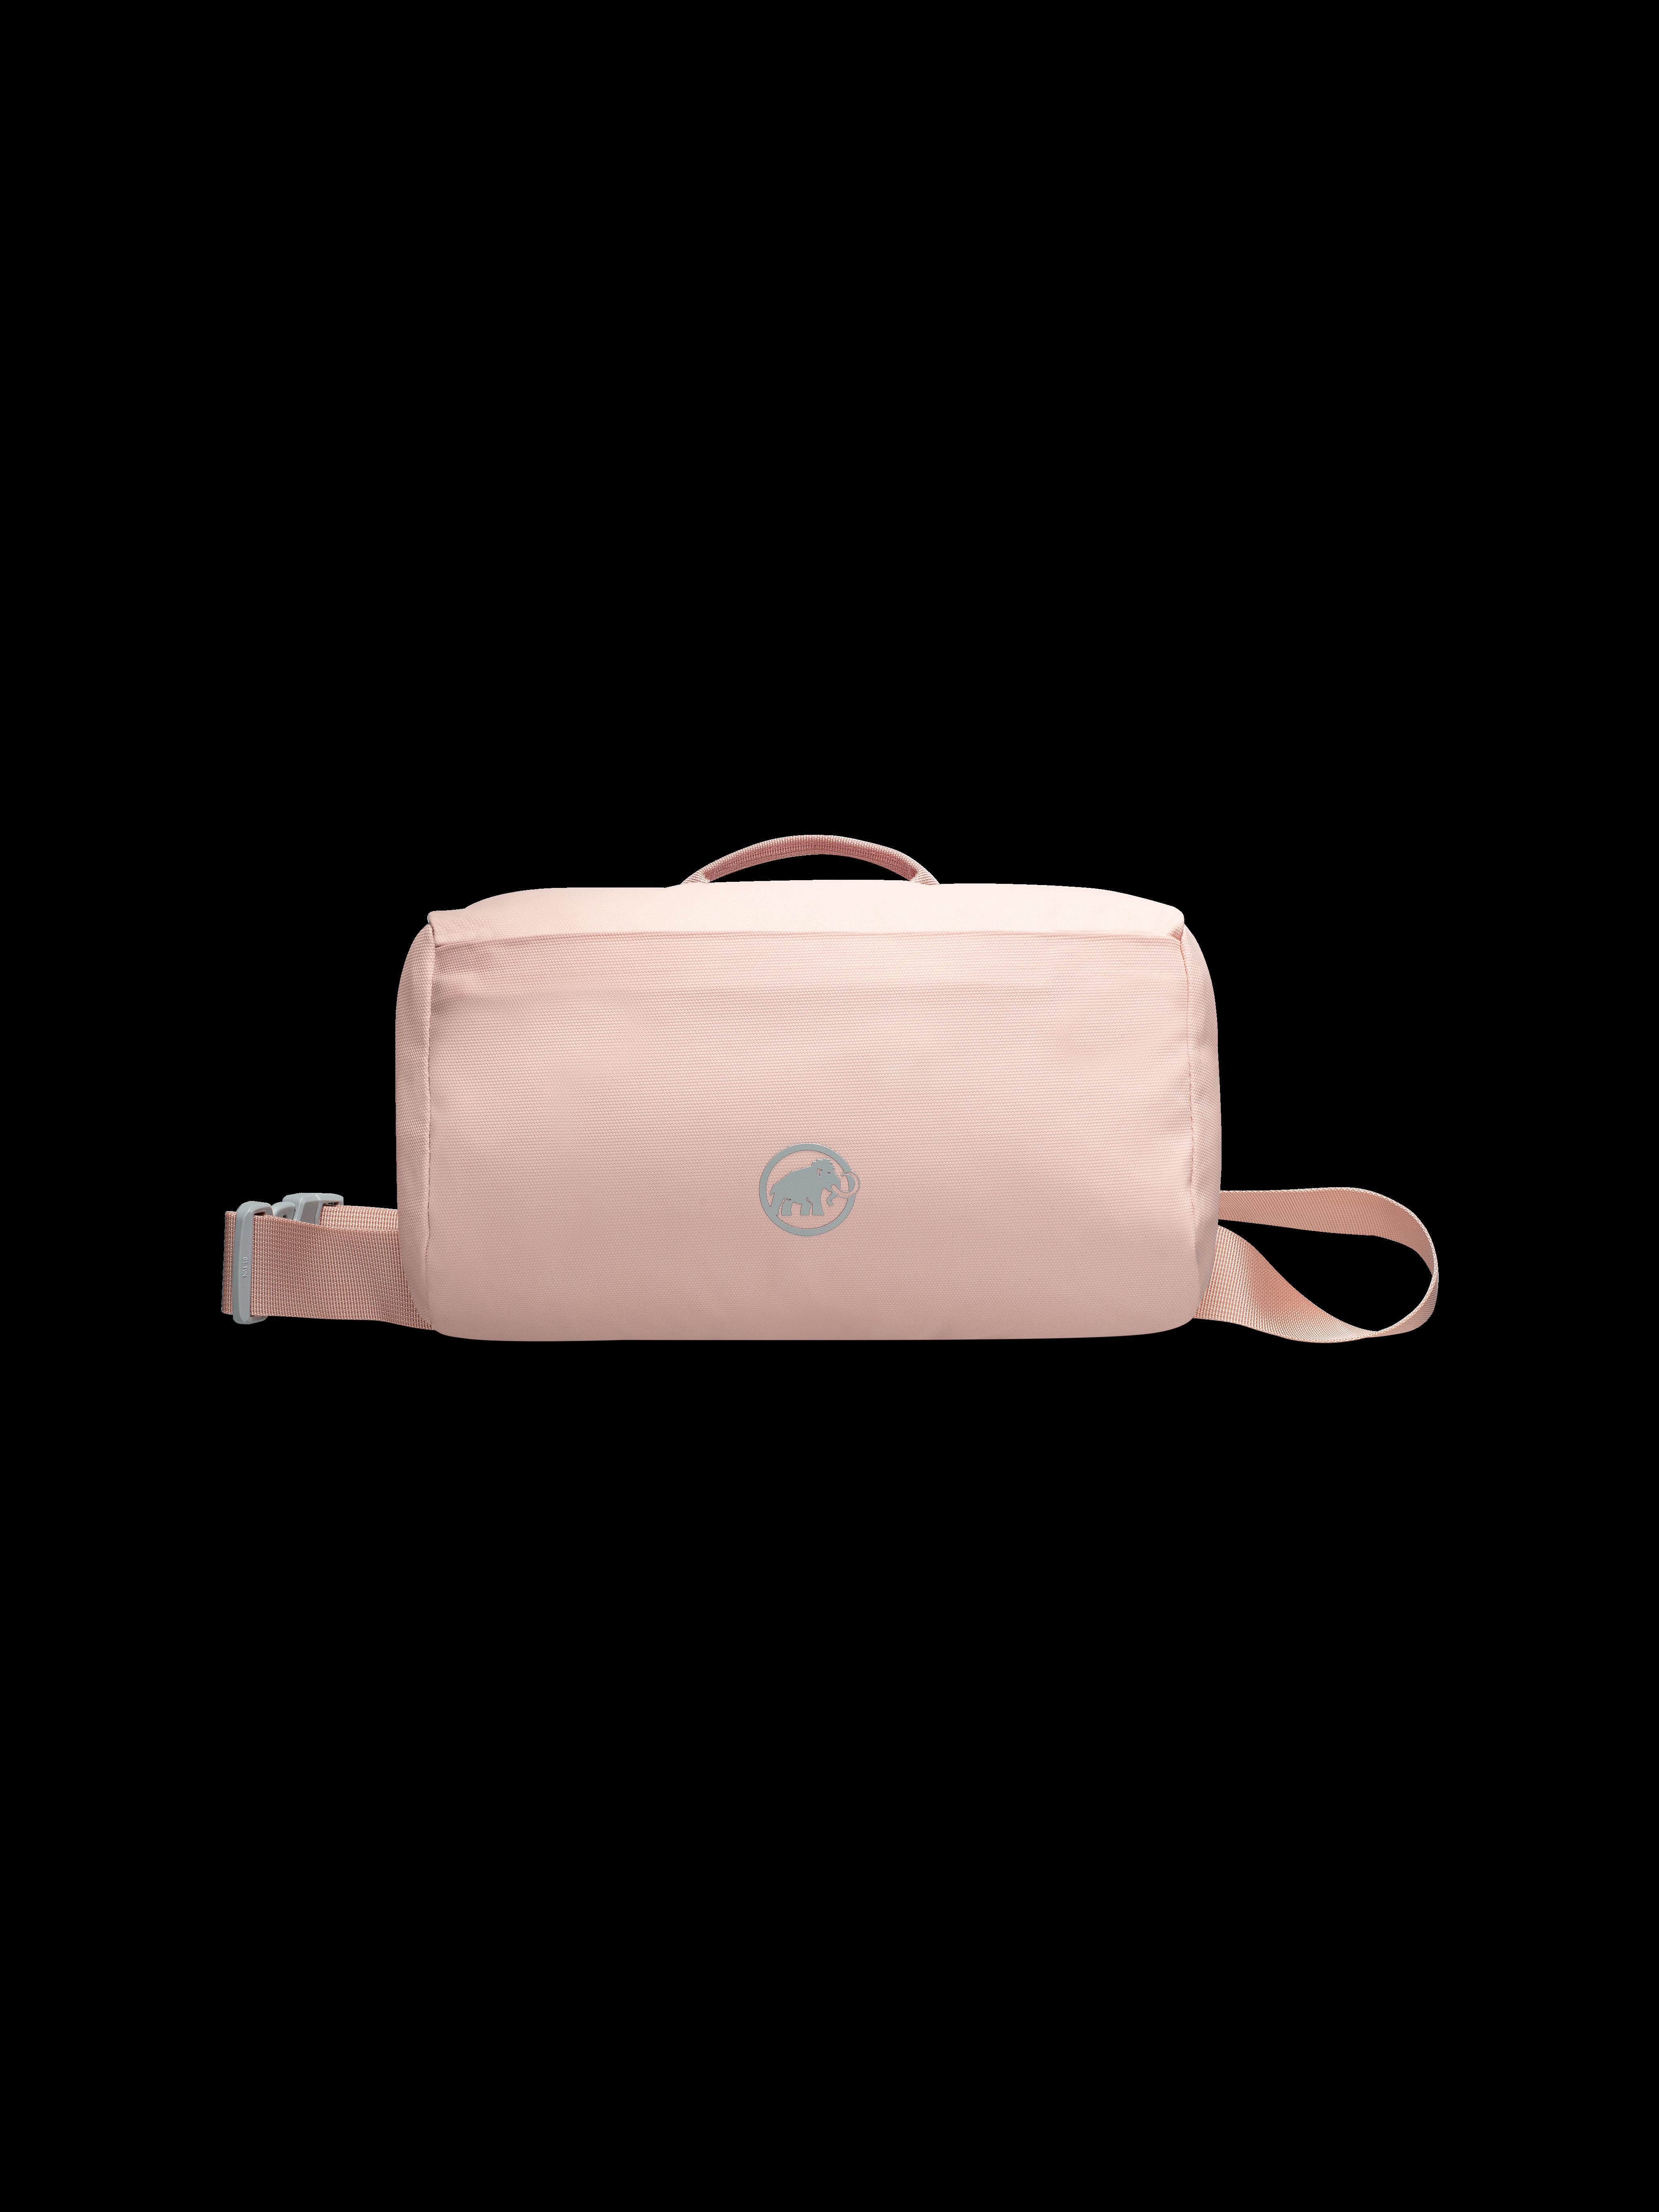 Seon 2-Way Waistpack product image